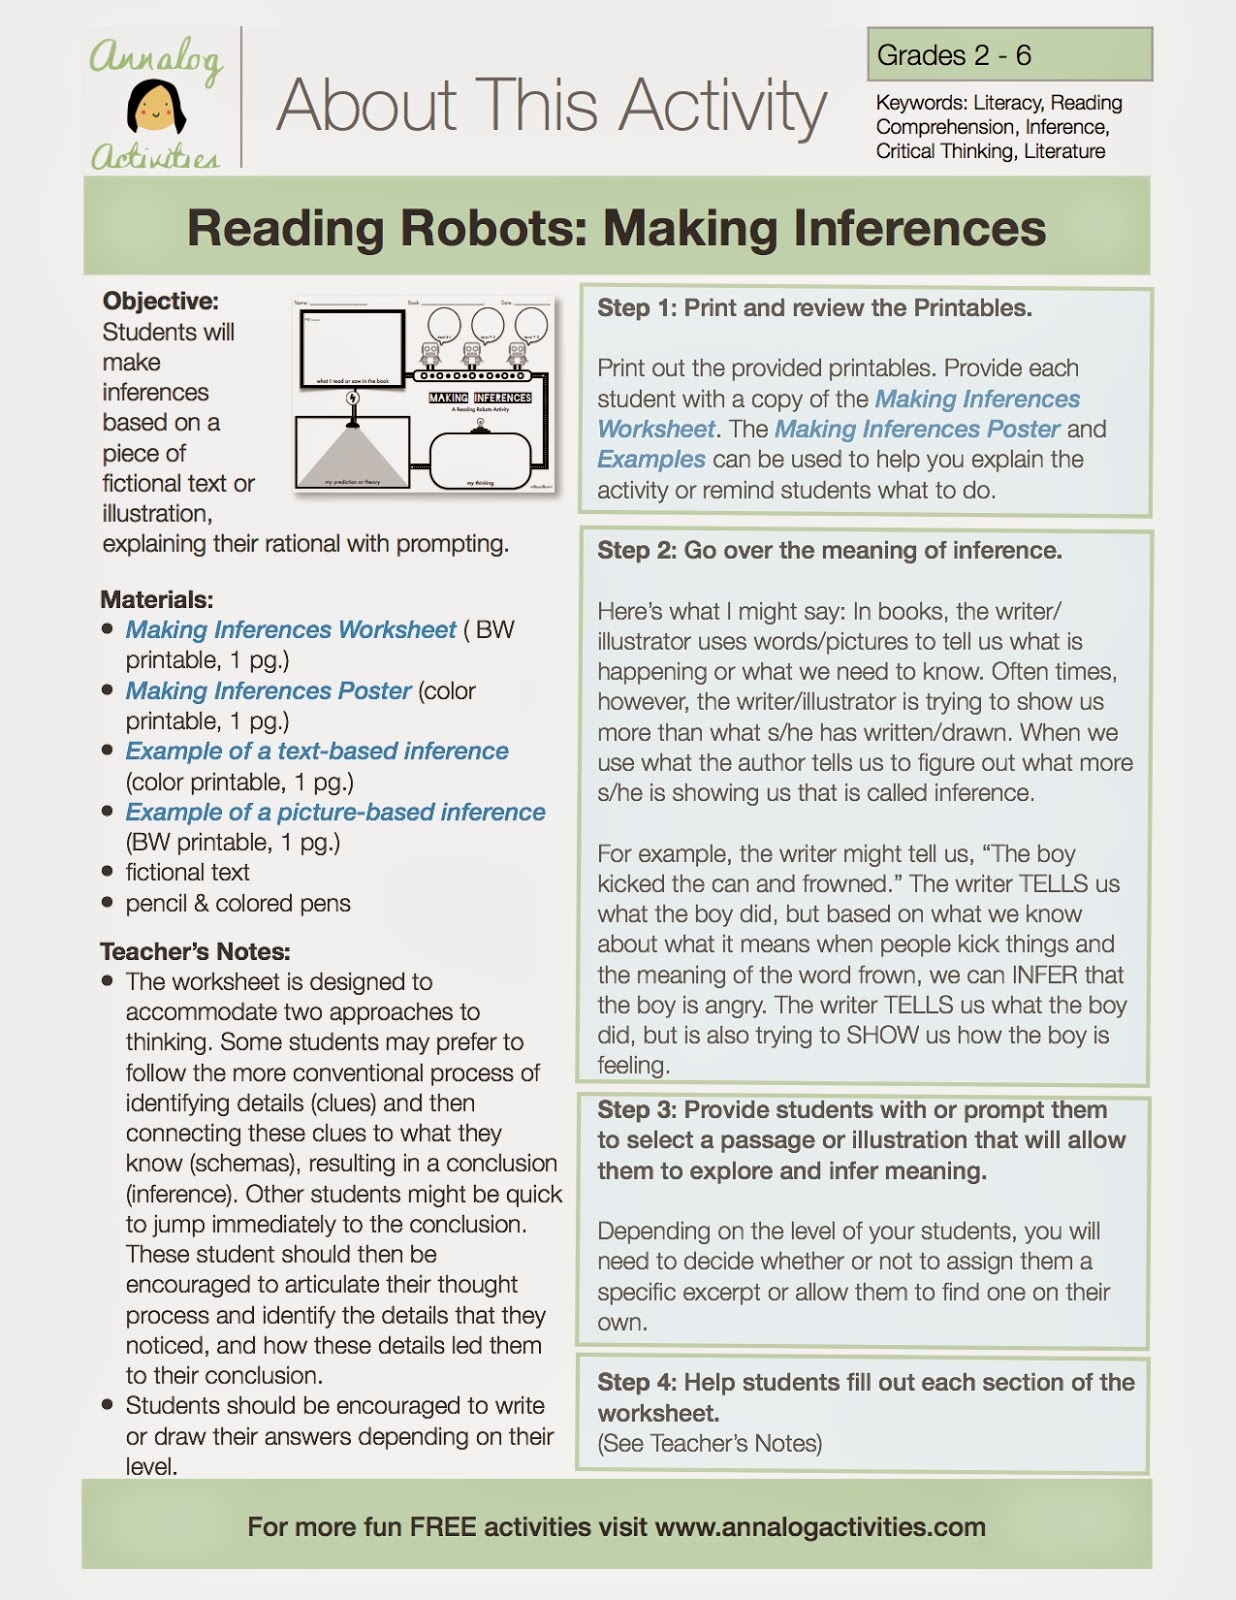 making inferences worksheet 4th grade